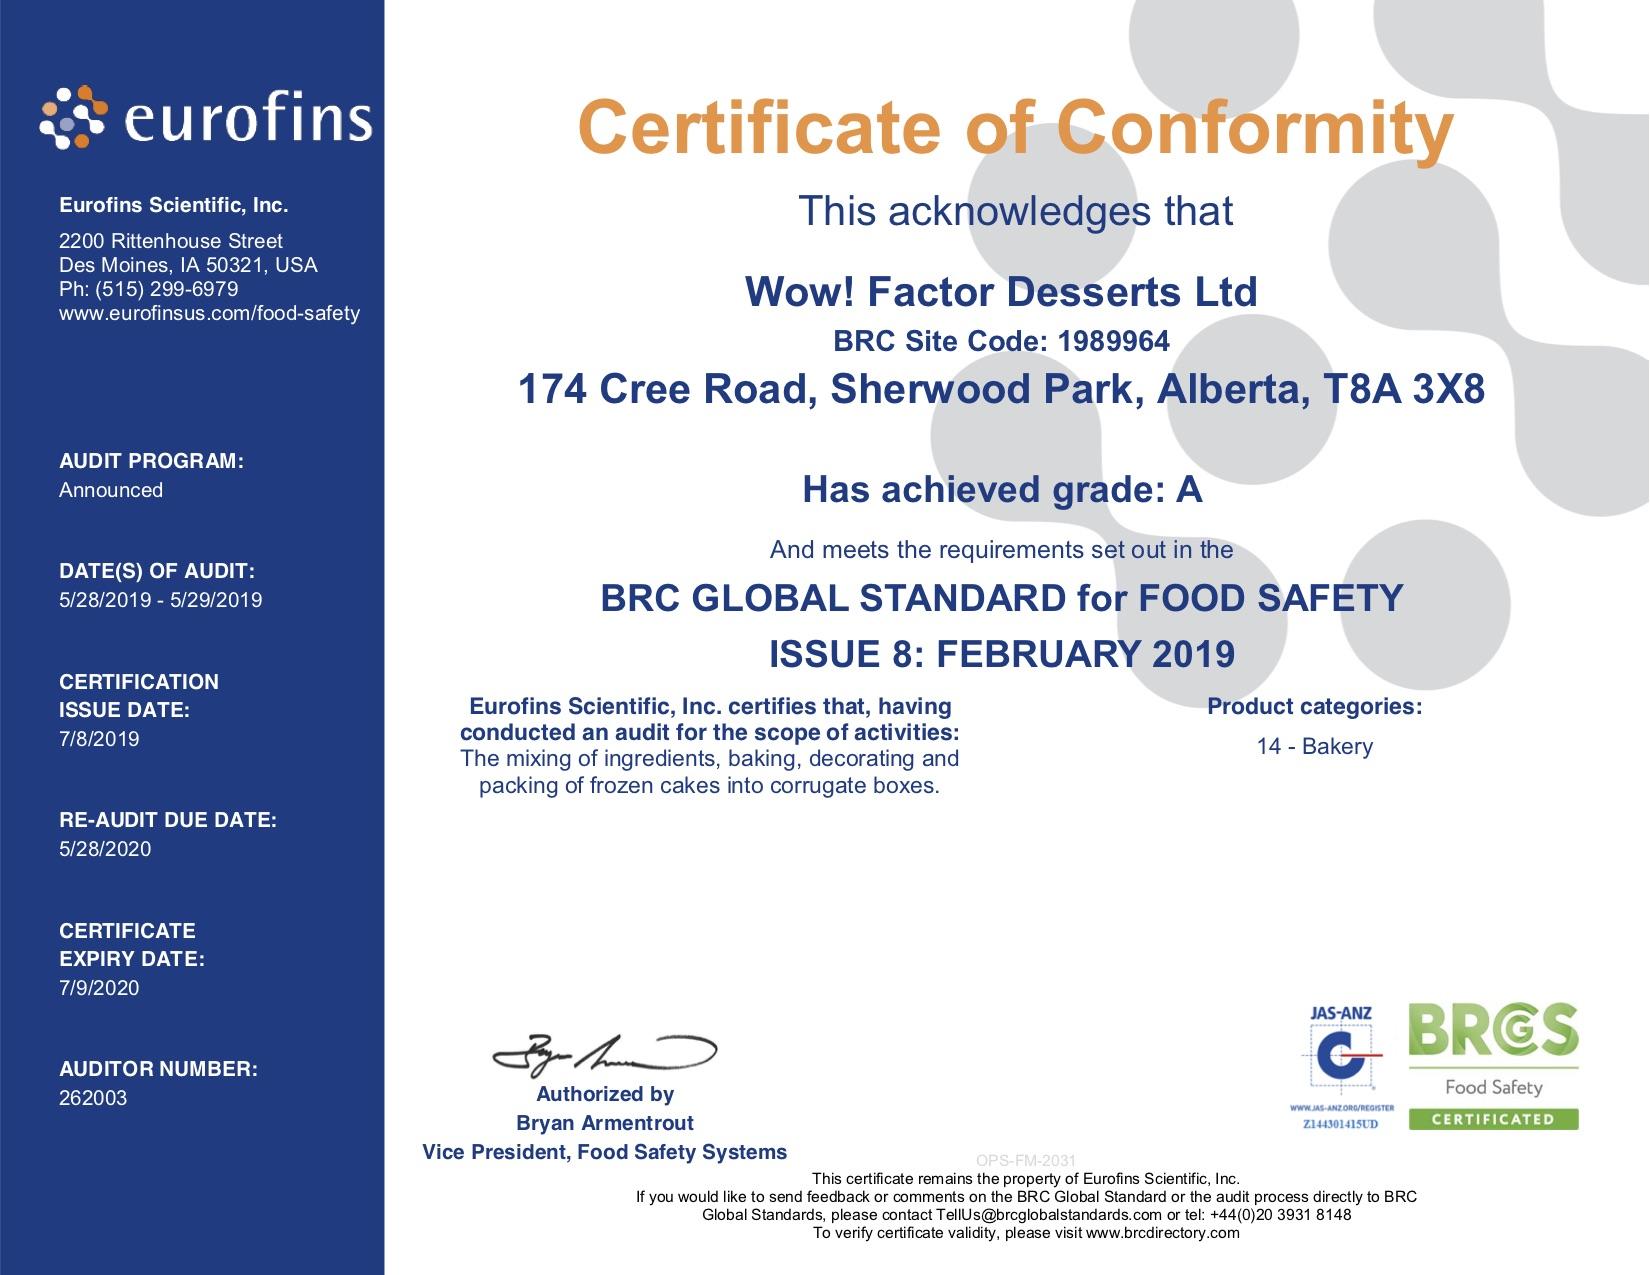 BRC Certificate - Wow! Factor Desserts Ltd 2019.jpg